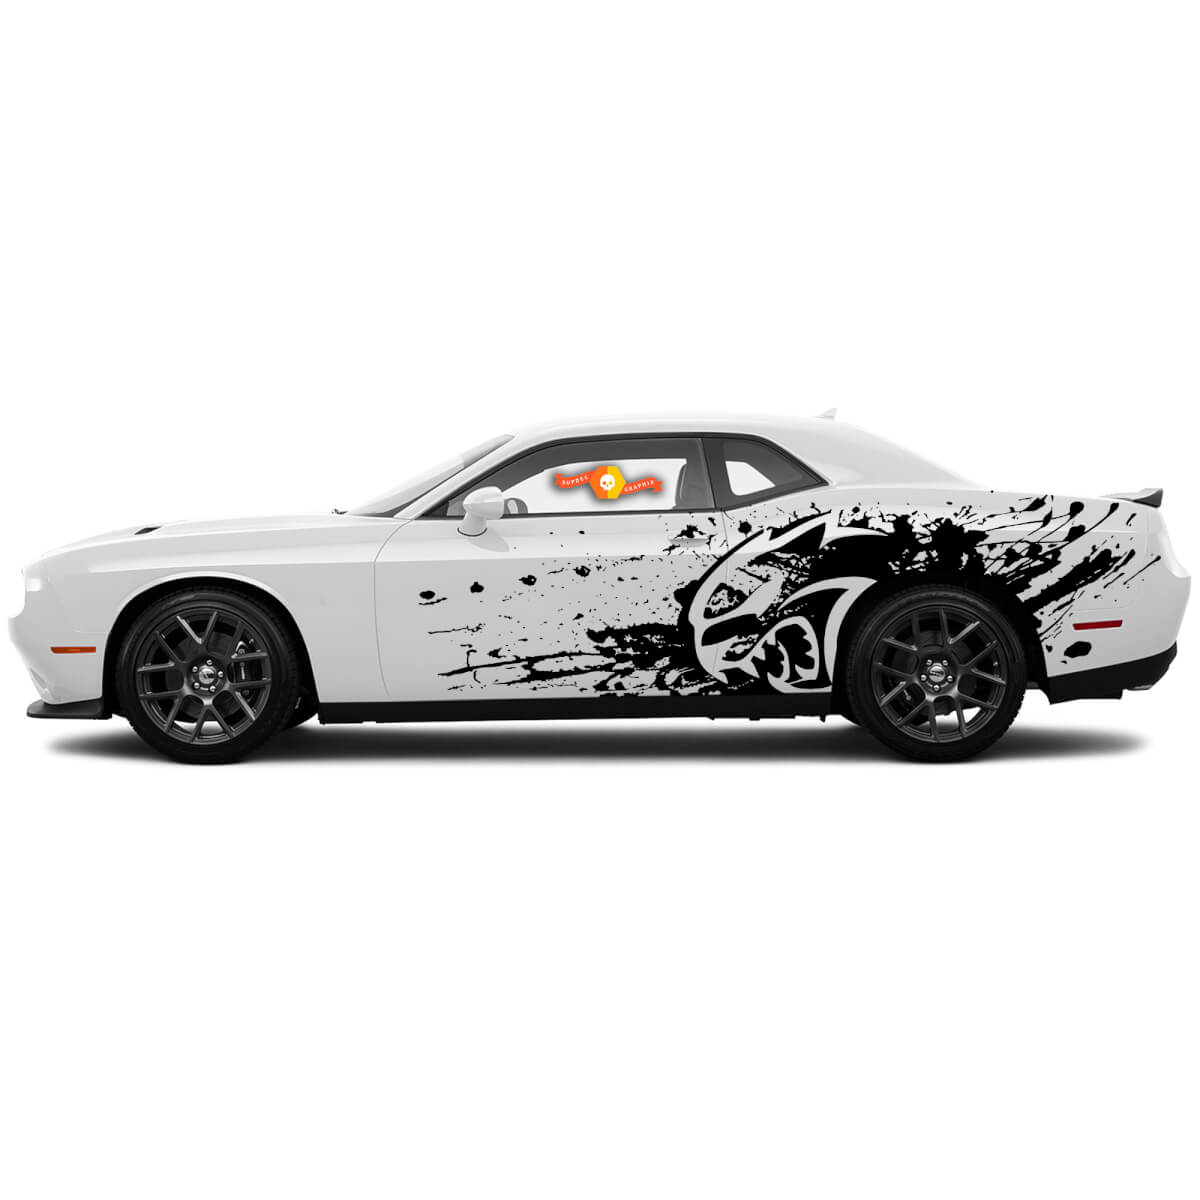 New Dodge Challenger Hellcat Star style Splash Grunge Stripes Kit Vinyl Decal Graphic